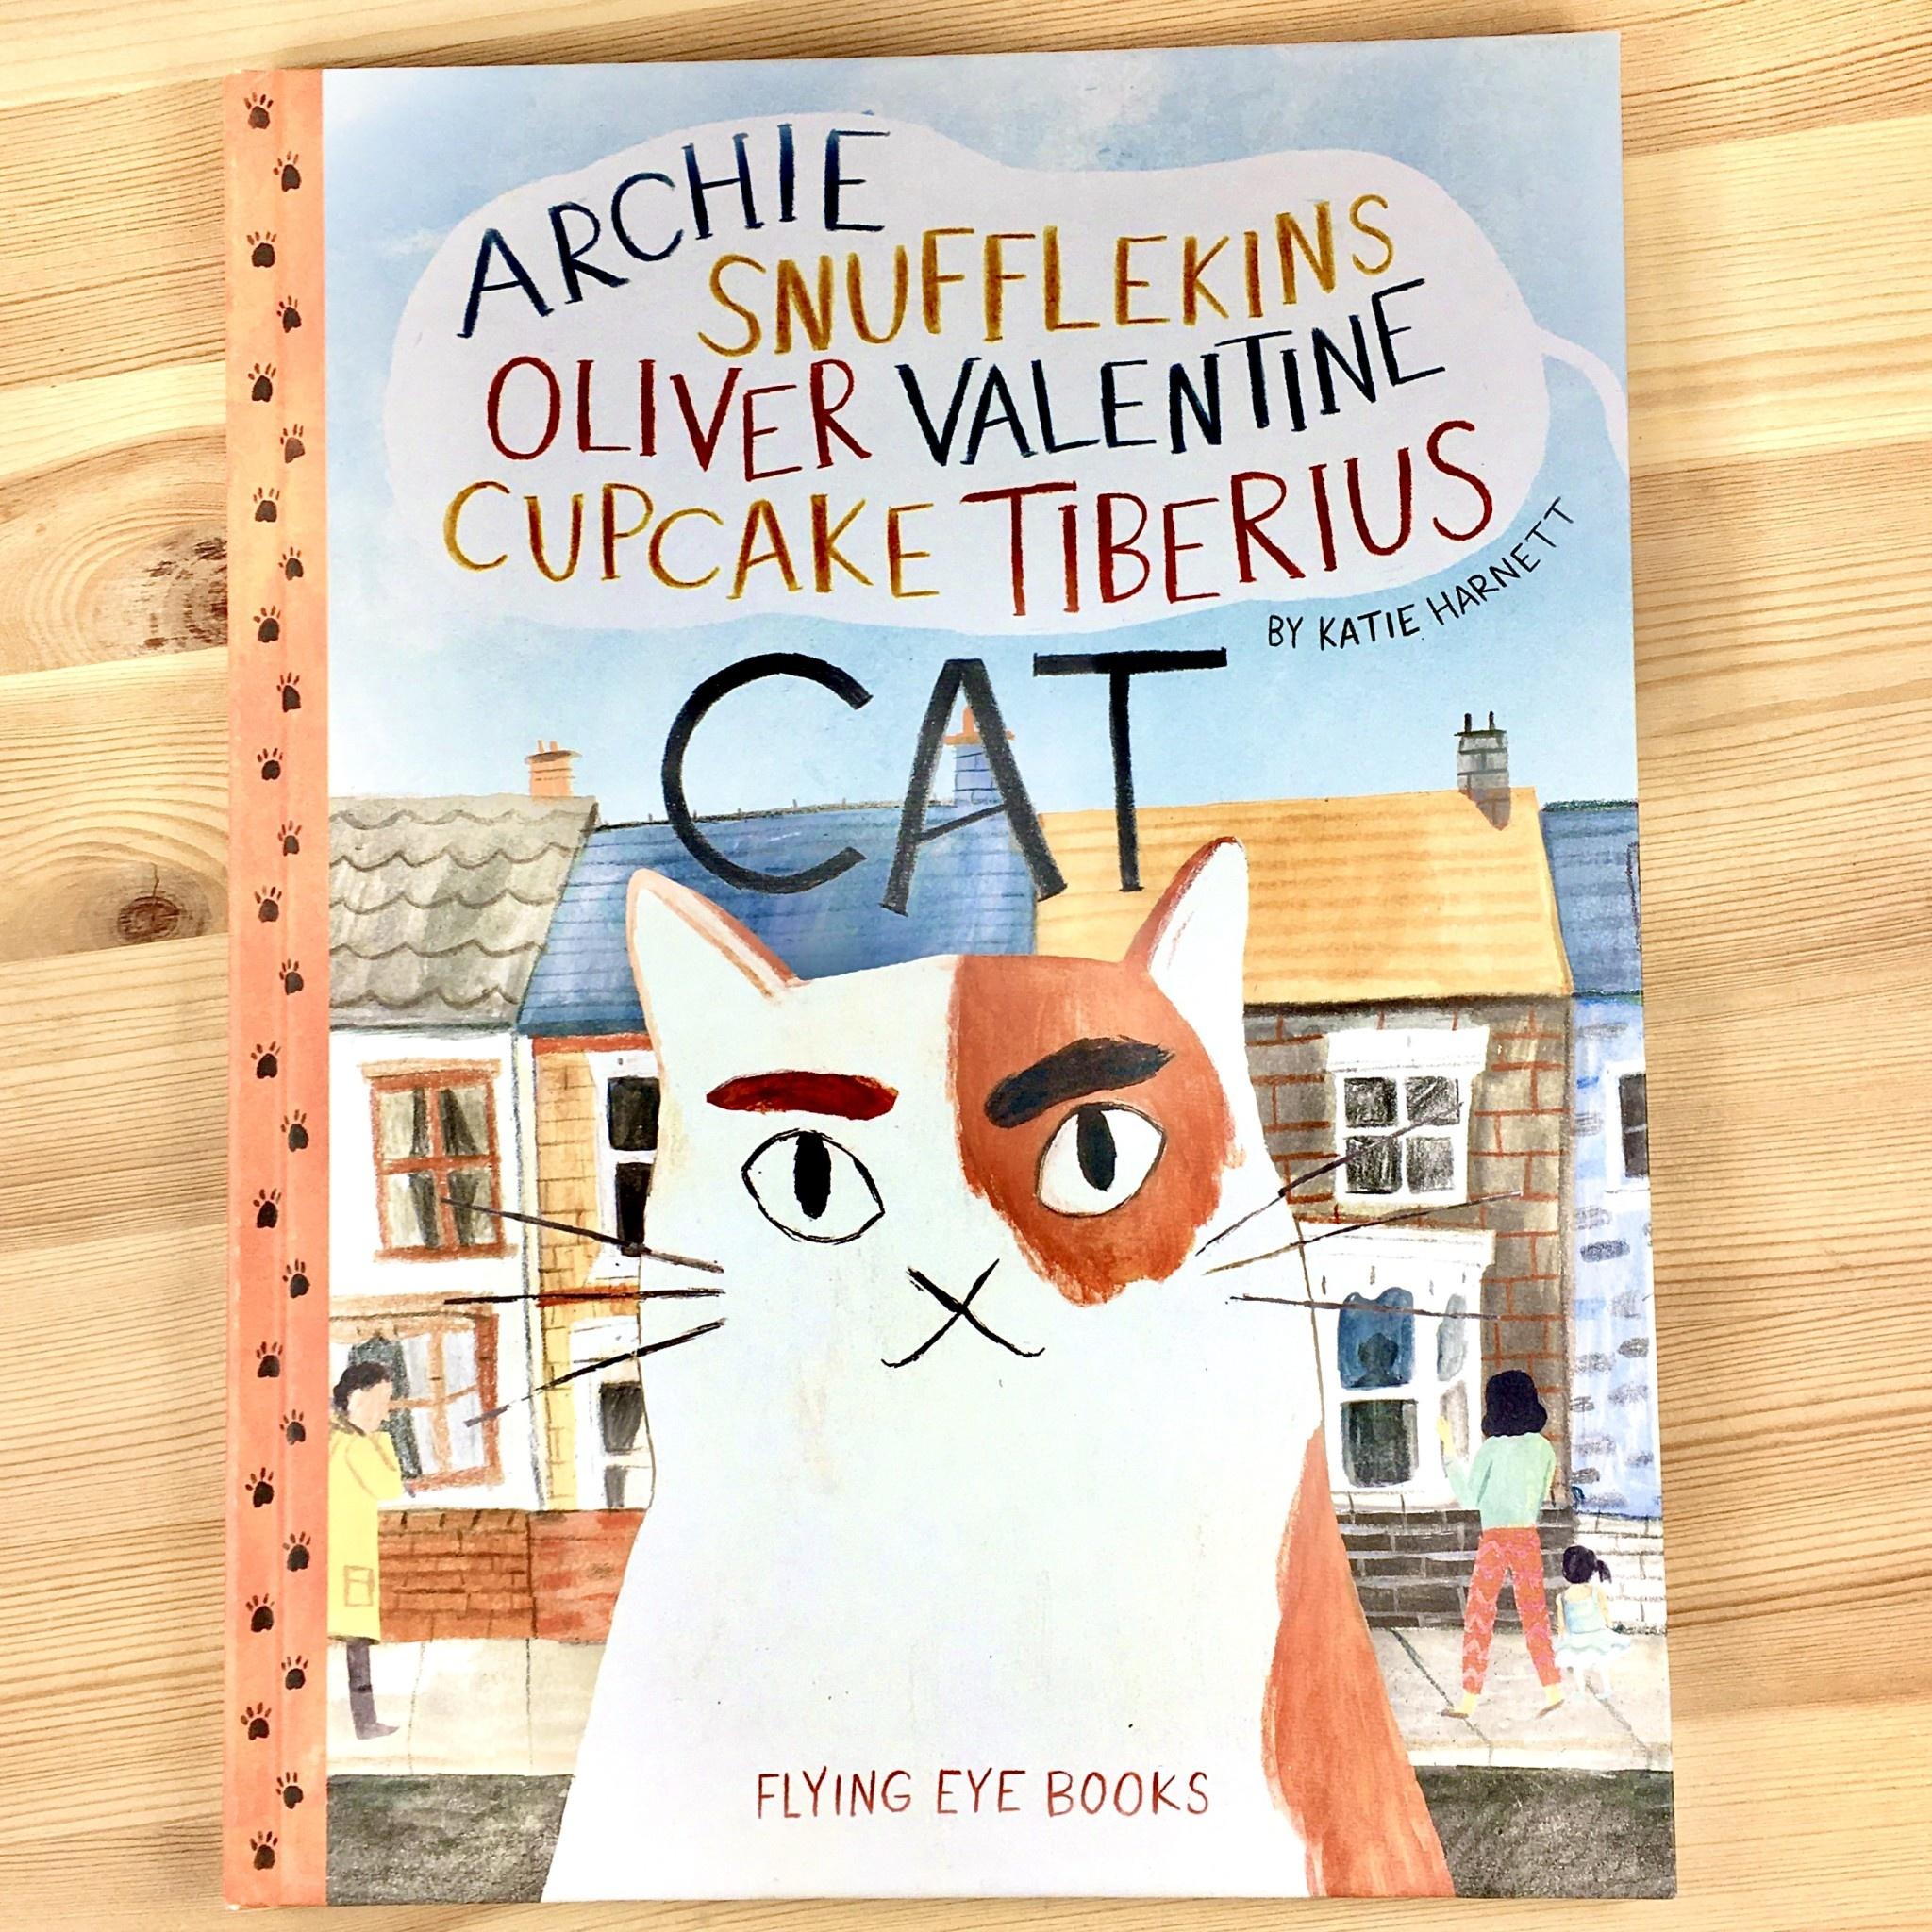 Katie Harnett Archie Snufflekins Oliver Valentine Cupcake Tiberius Cat Book - Katie Harnett